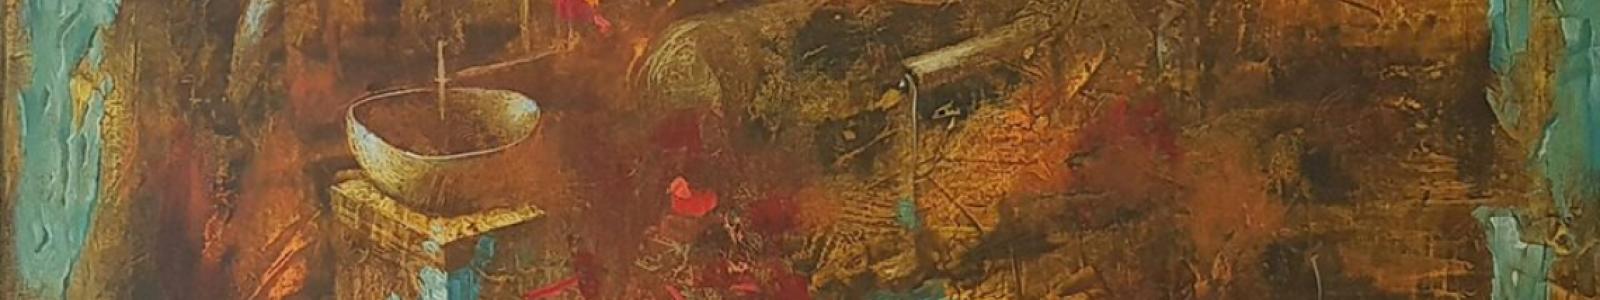 Gallery Painter alexandr Dobrodiy